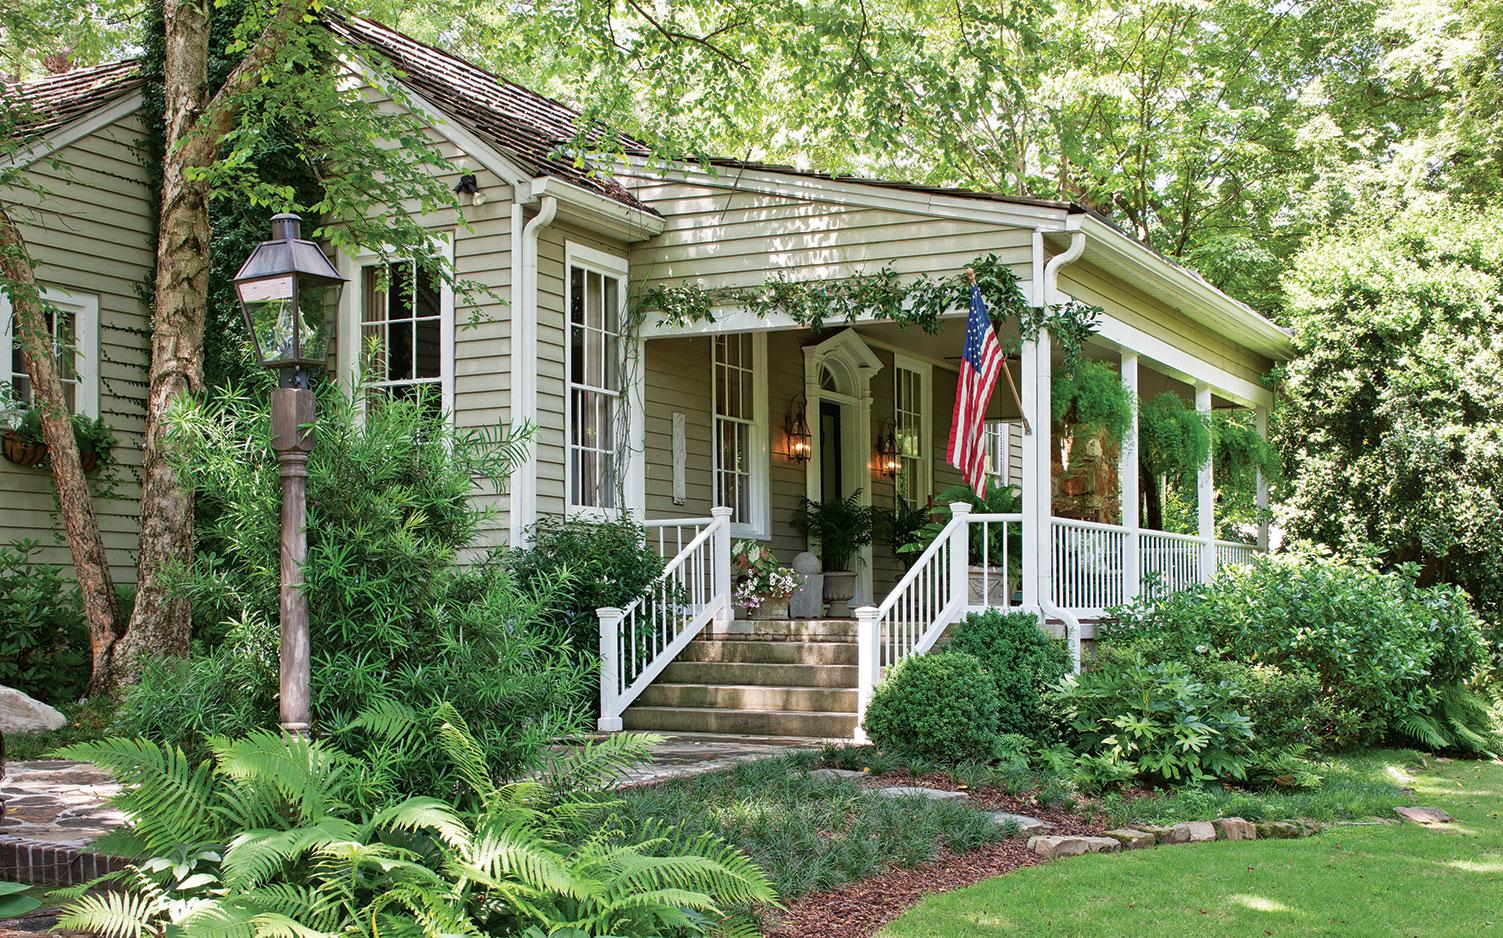 Cottage Garden Charm - Southern Lady Magazine on Bungalow Backyard Ideas id=72613